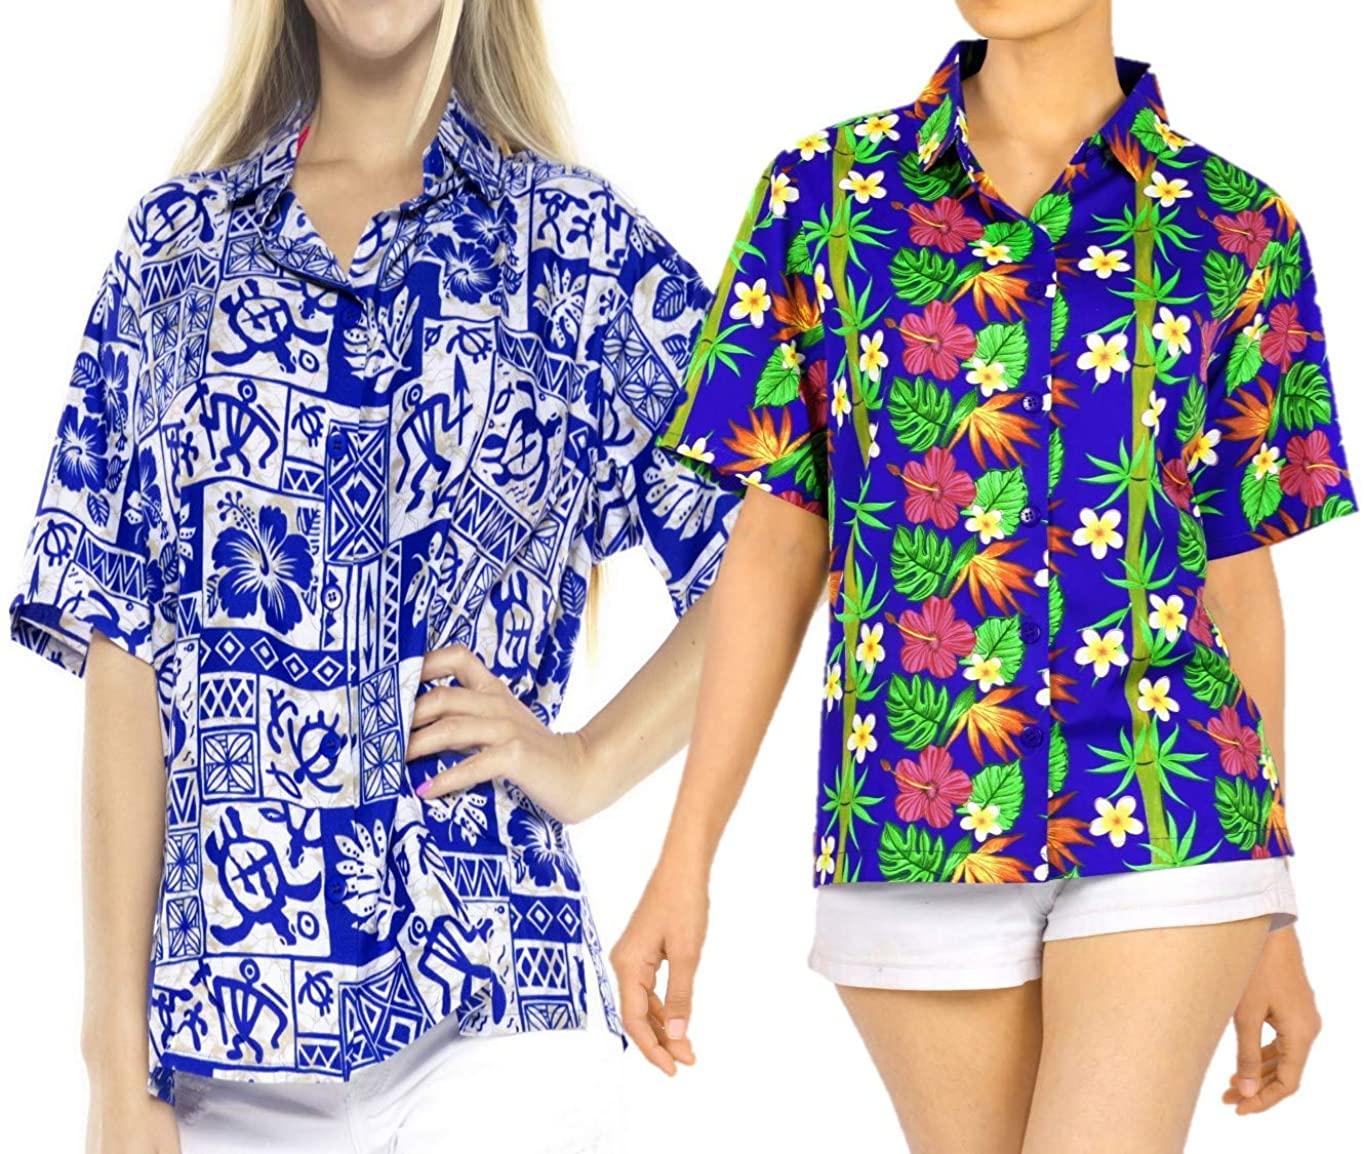 LA LEELA Women's Beach Hawaiian Shirt Button Down Aloha Party Shirt Work from Home Clothes Women Beach Shirt Blouse Shirt Combo Pack of 2 Size XL